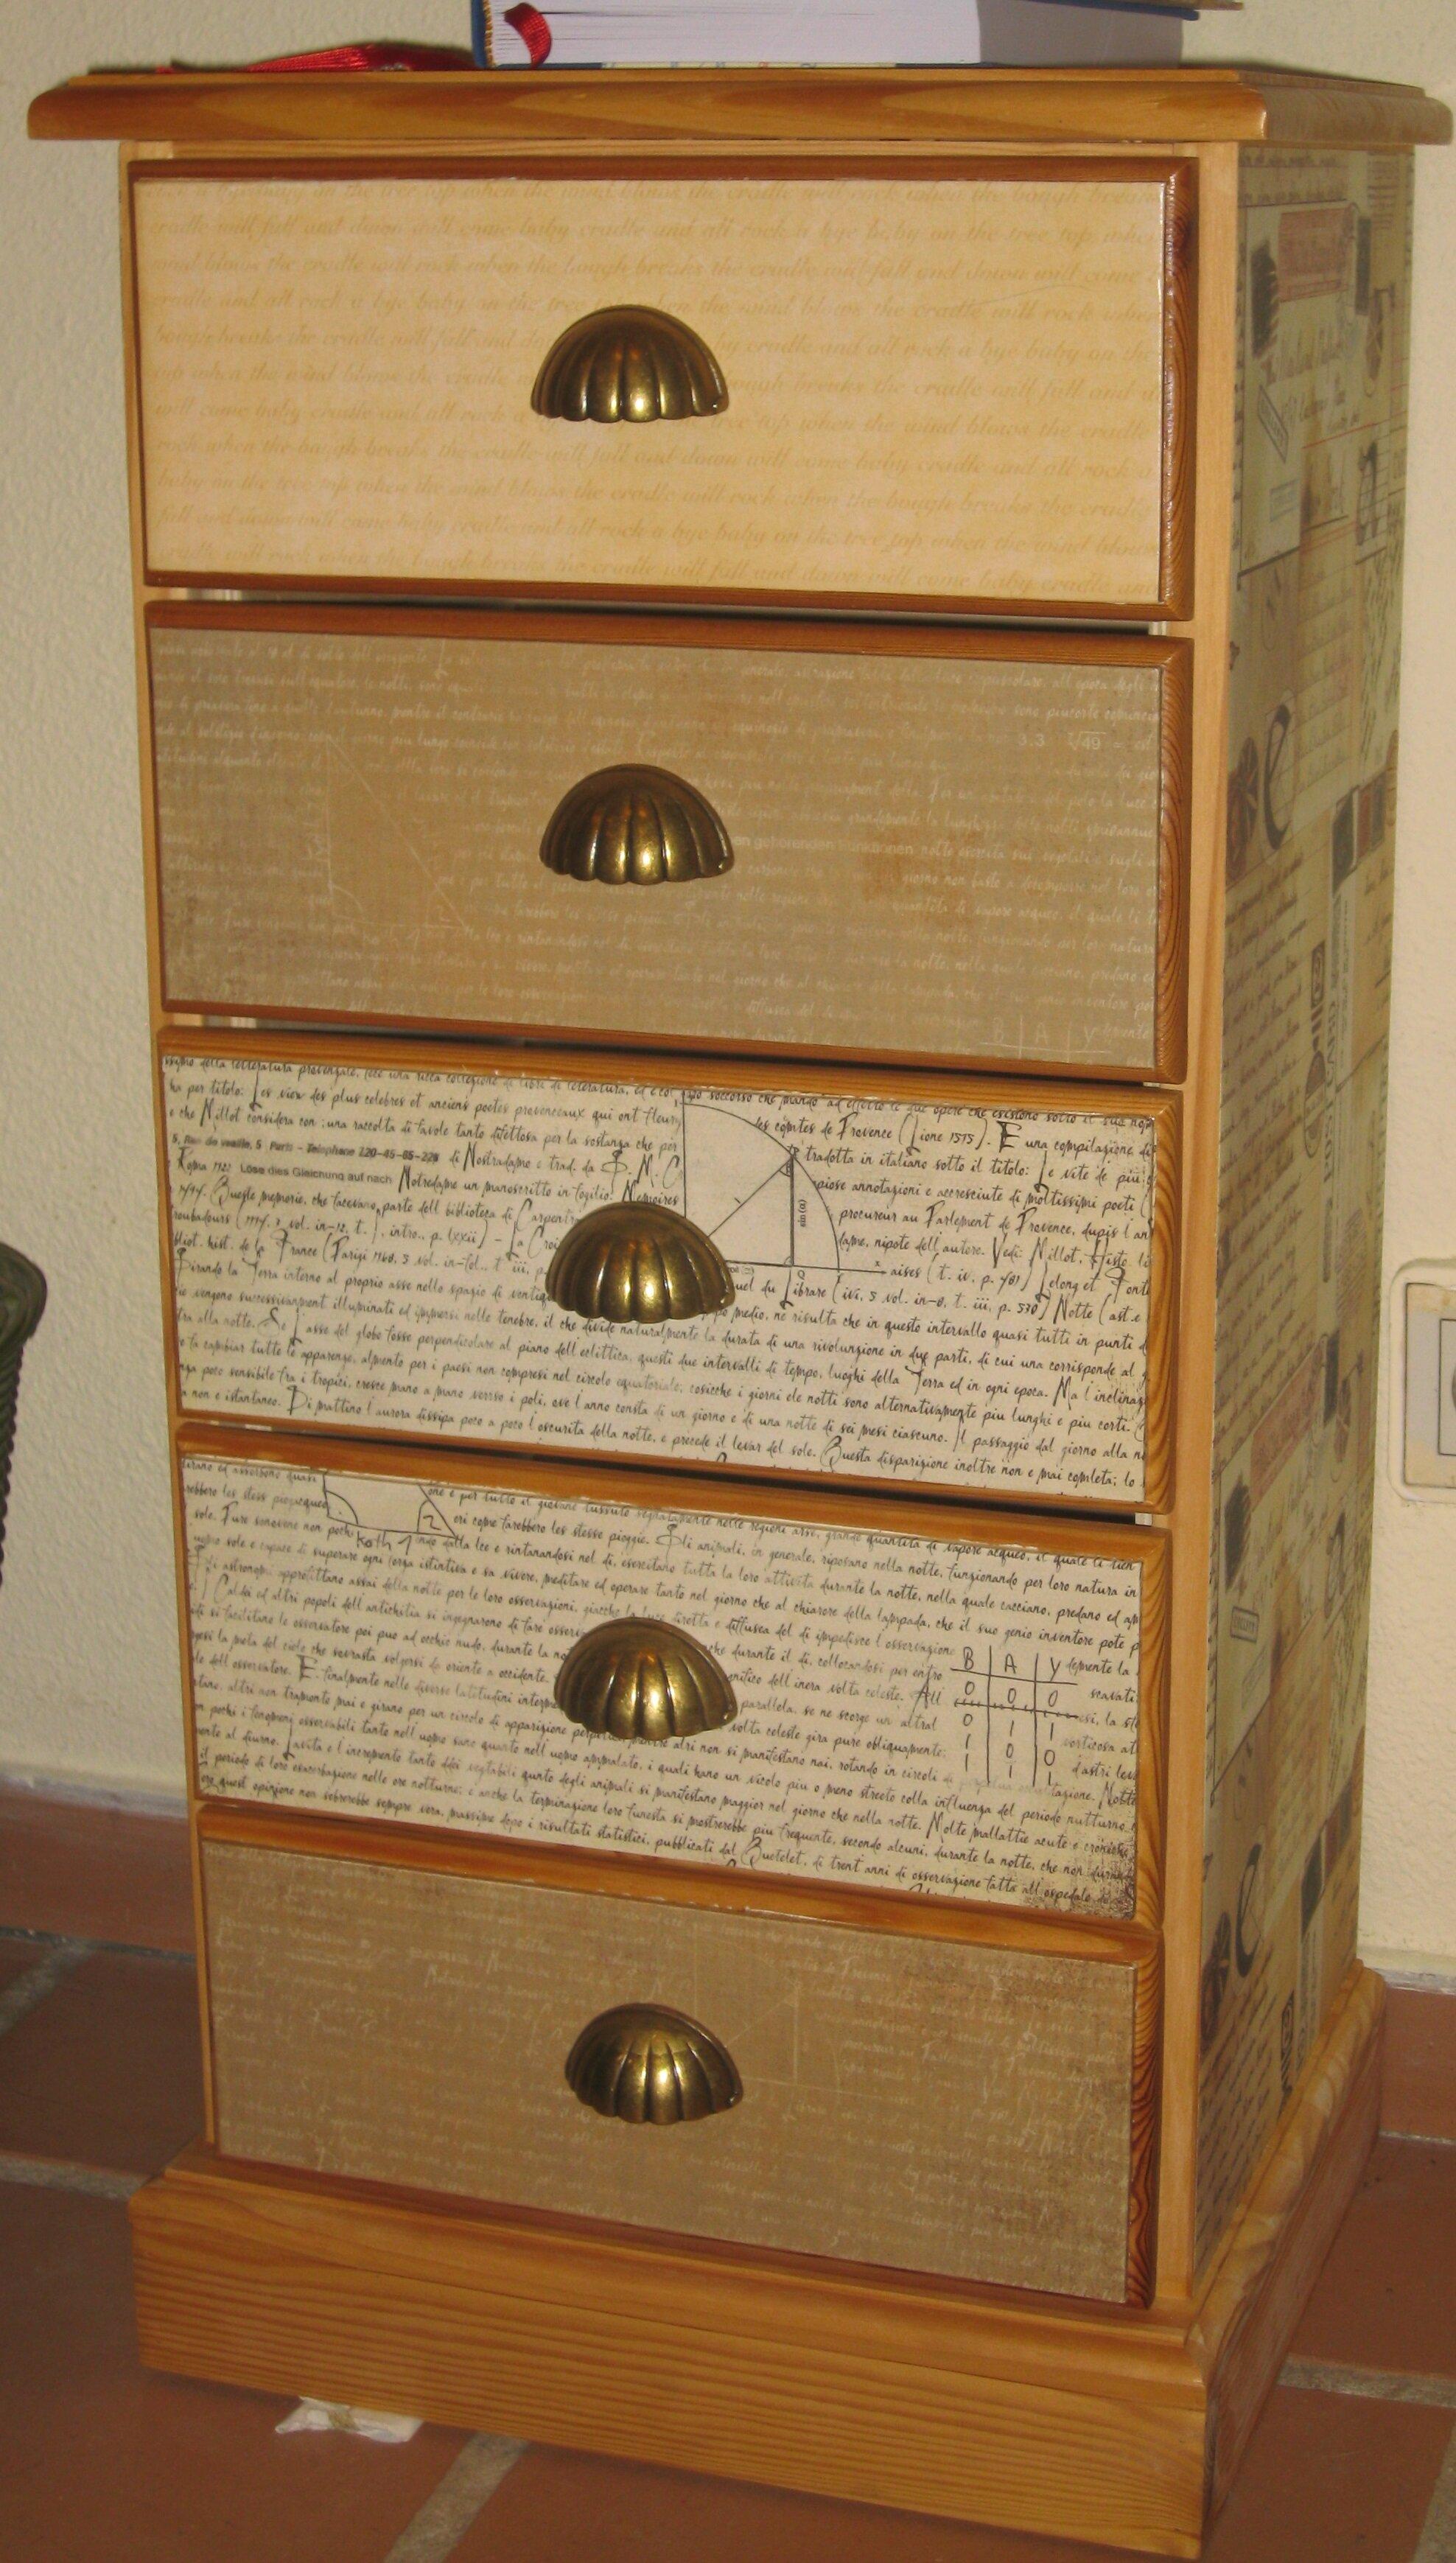 Muebles pino sin tratar finest muebles de pino sin tratar for Muebles de pino sin tratar